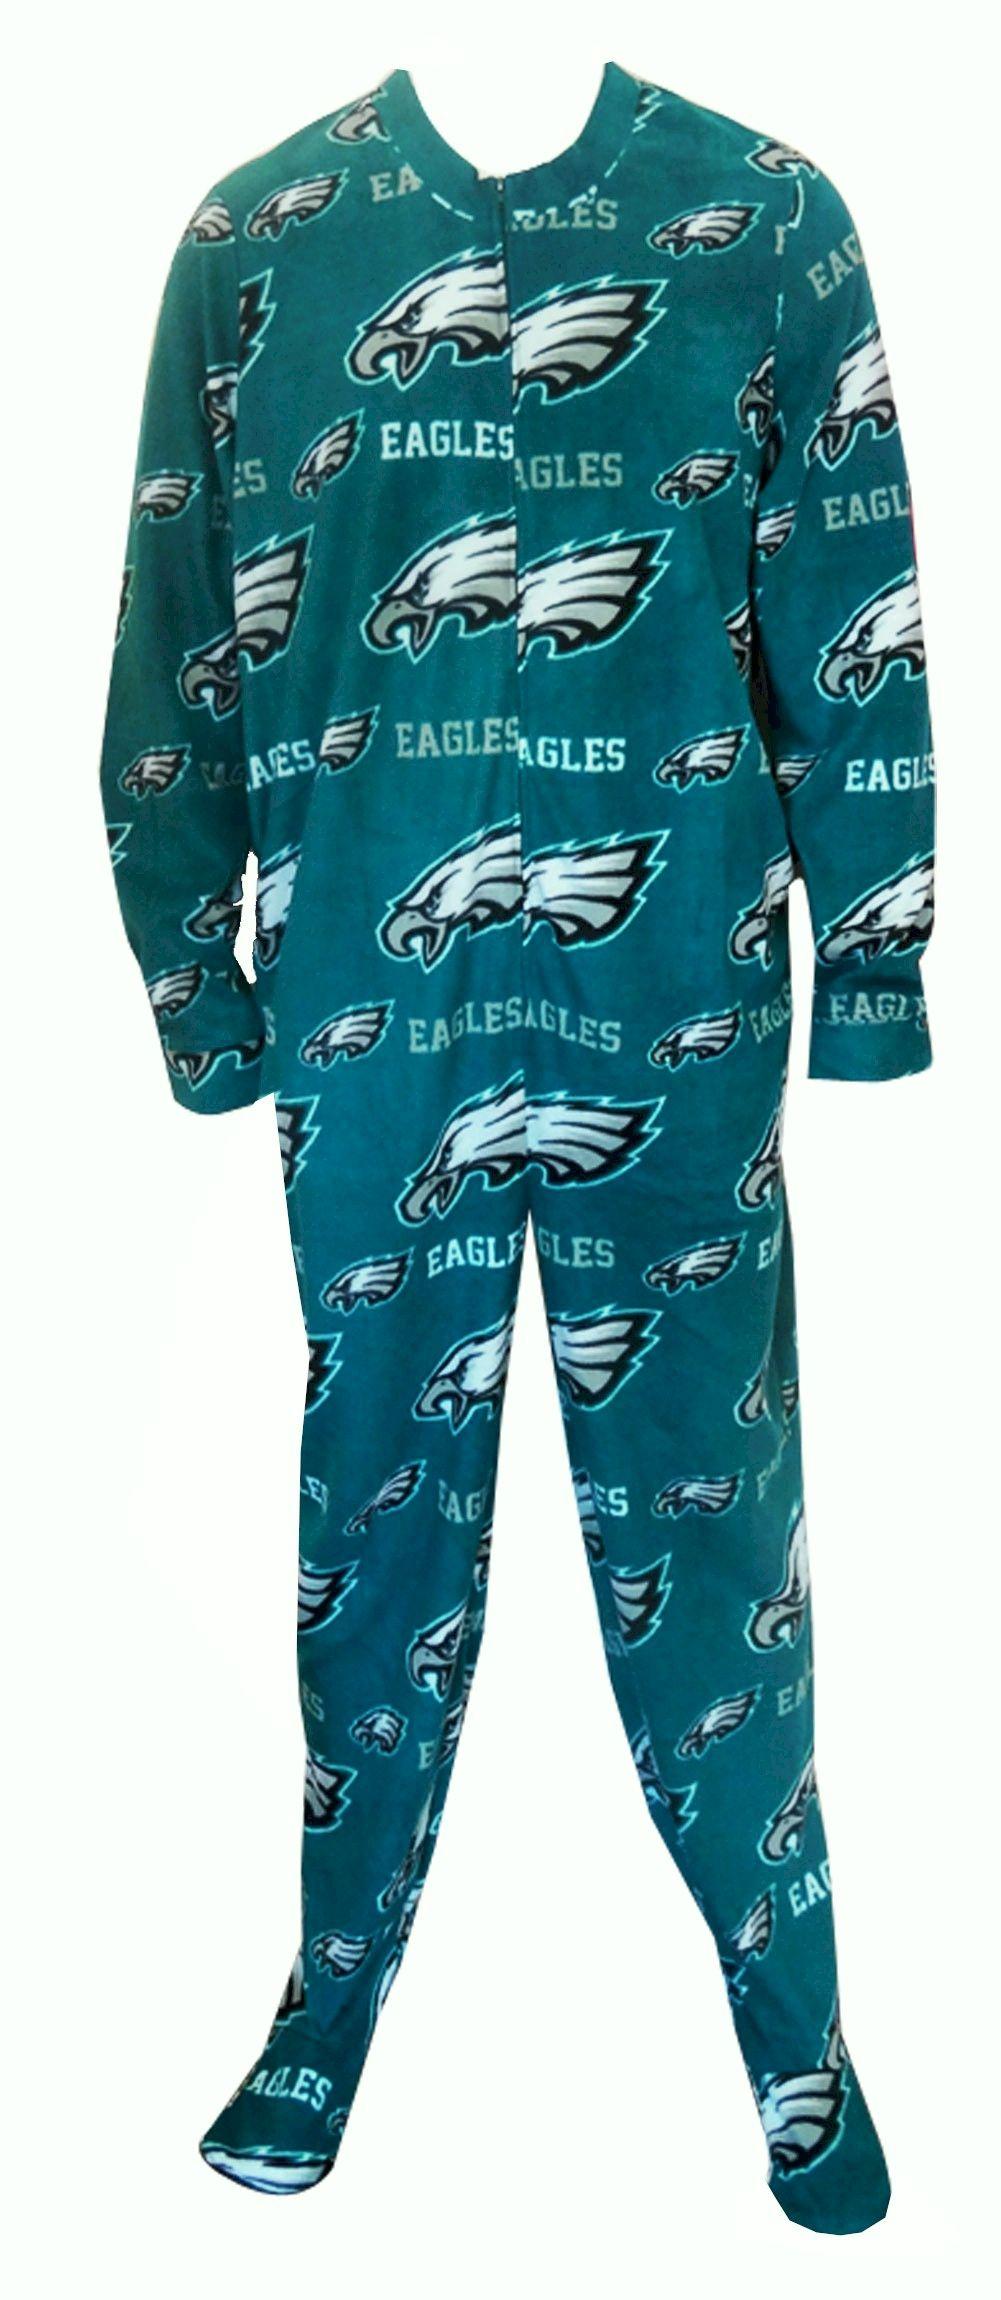 e61ae214 Philadelphia Eagles Guys Onesie Footie Pajama Show your team spirit ...